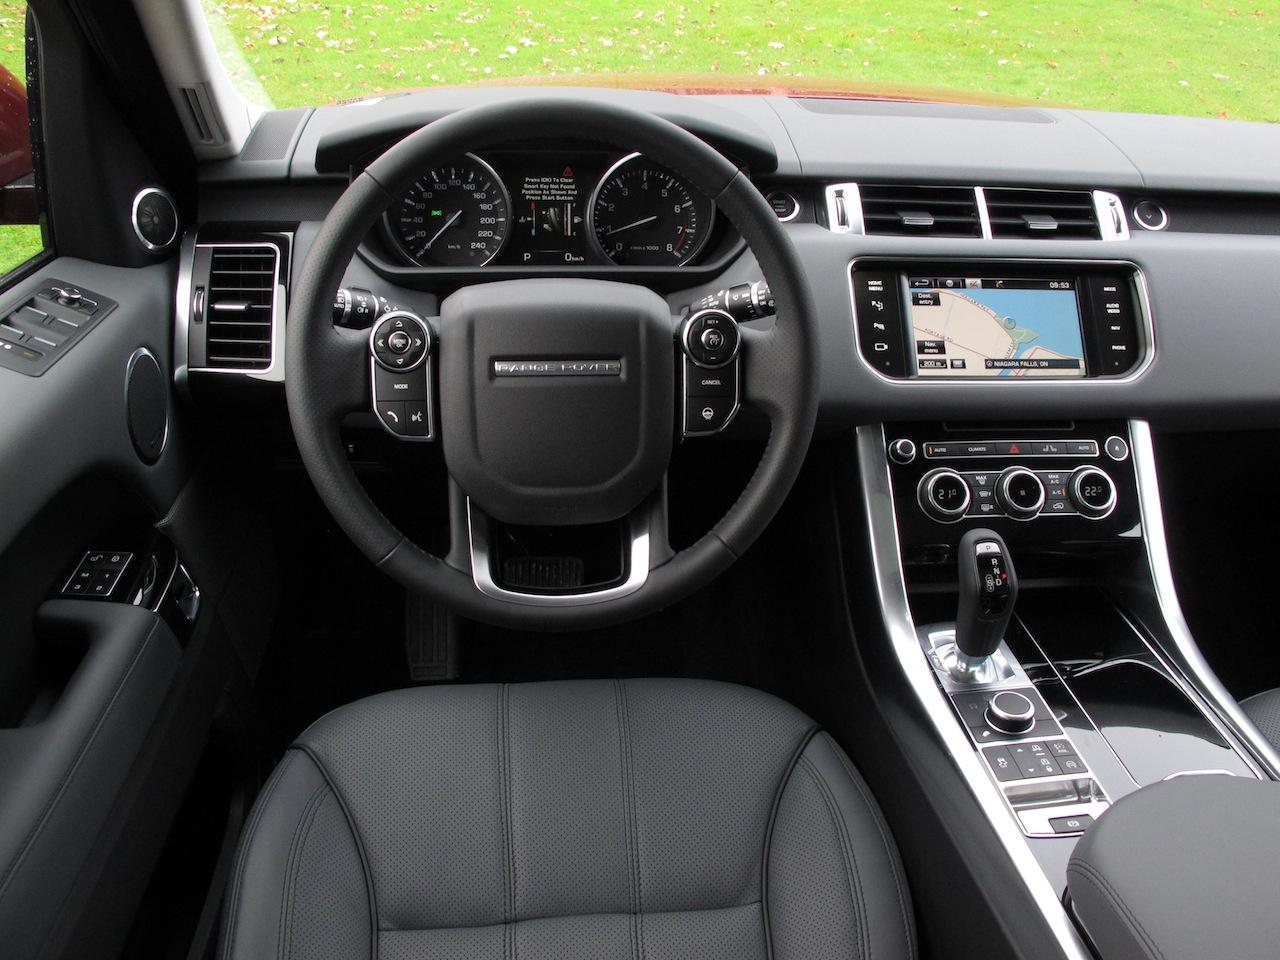 Range Rover Sport 2014 Bmw X5 2014 Autos Weblog